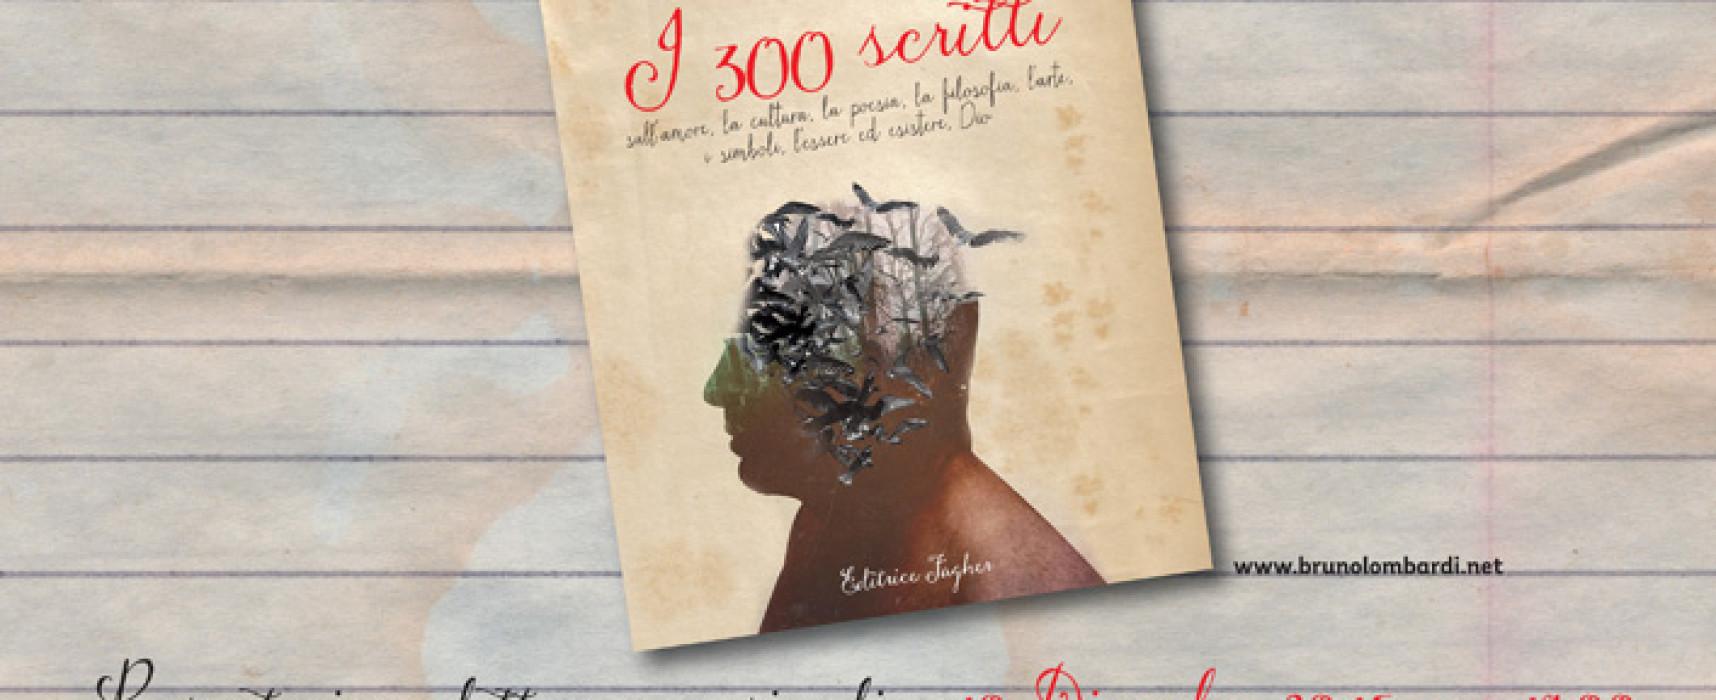 300 scritti di Bruno Lombardi